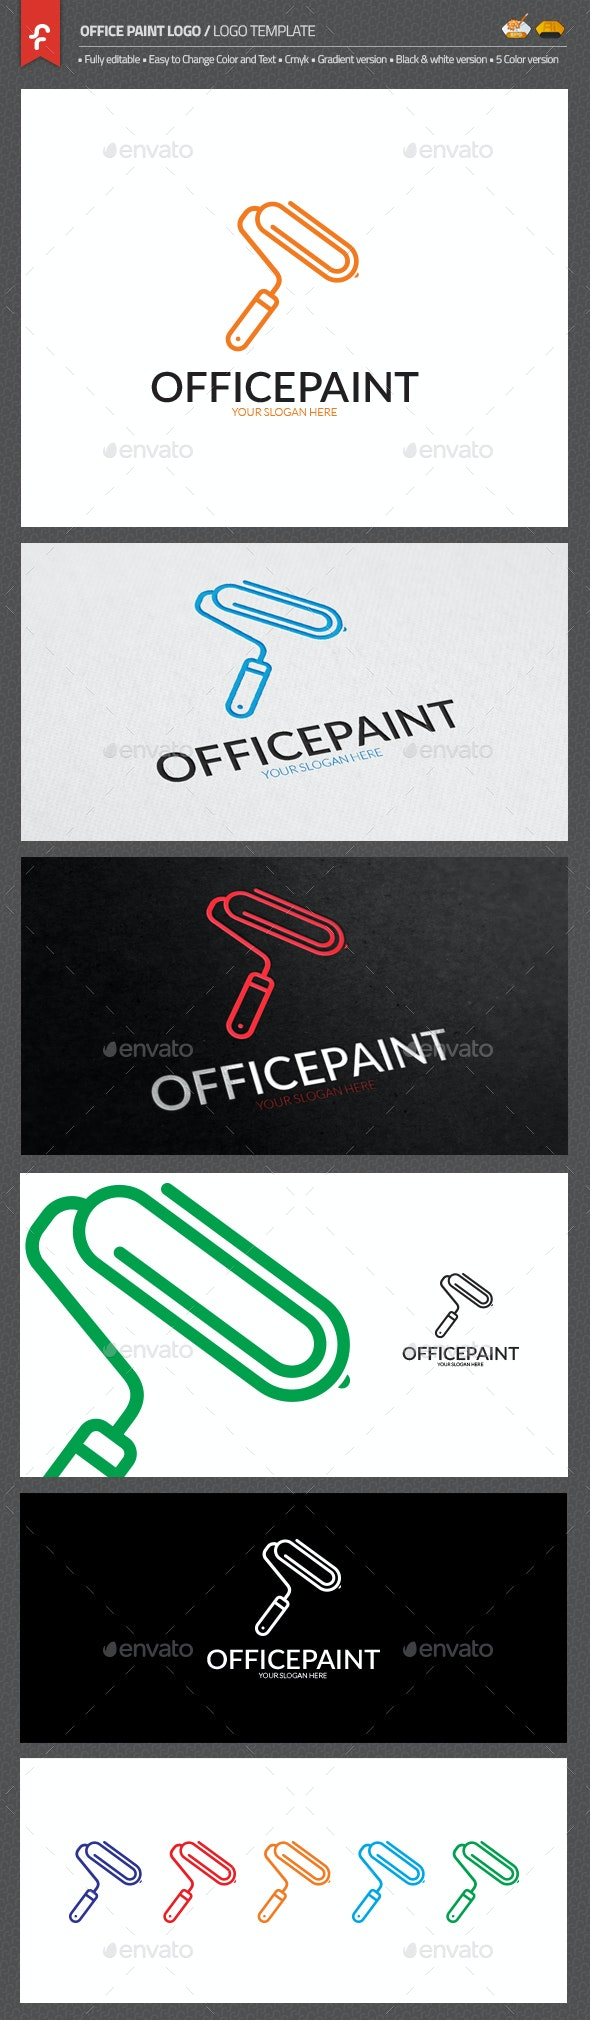 Office Paint Logo - Objects Logo Templates